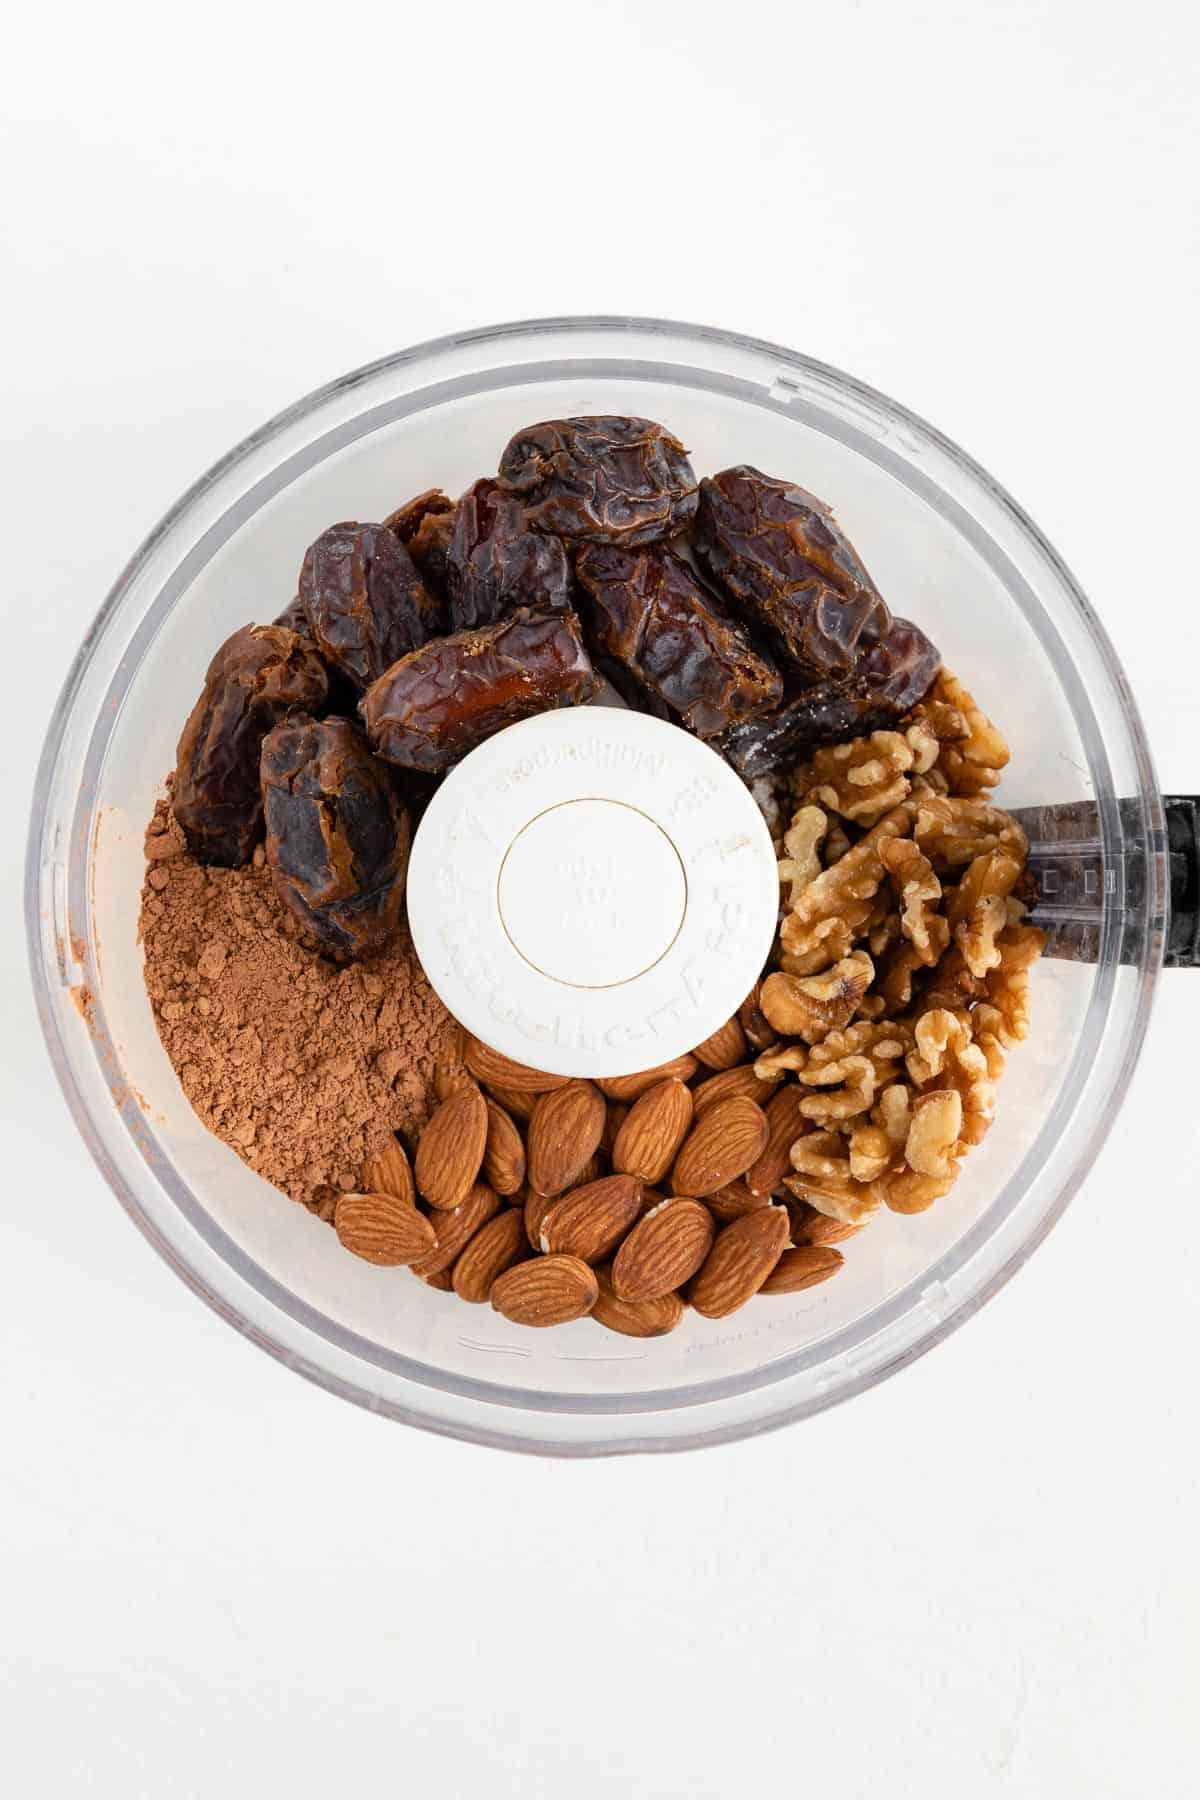 medjool dates, almonds, walnuts, and cocoa powder in a food processor